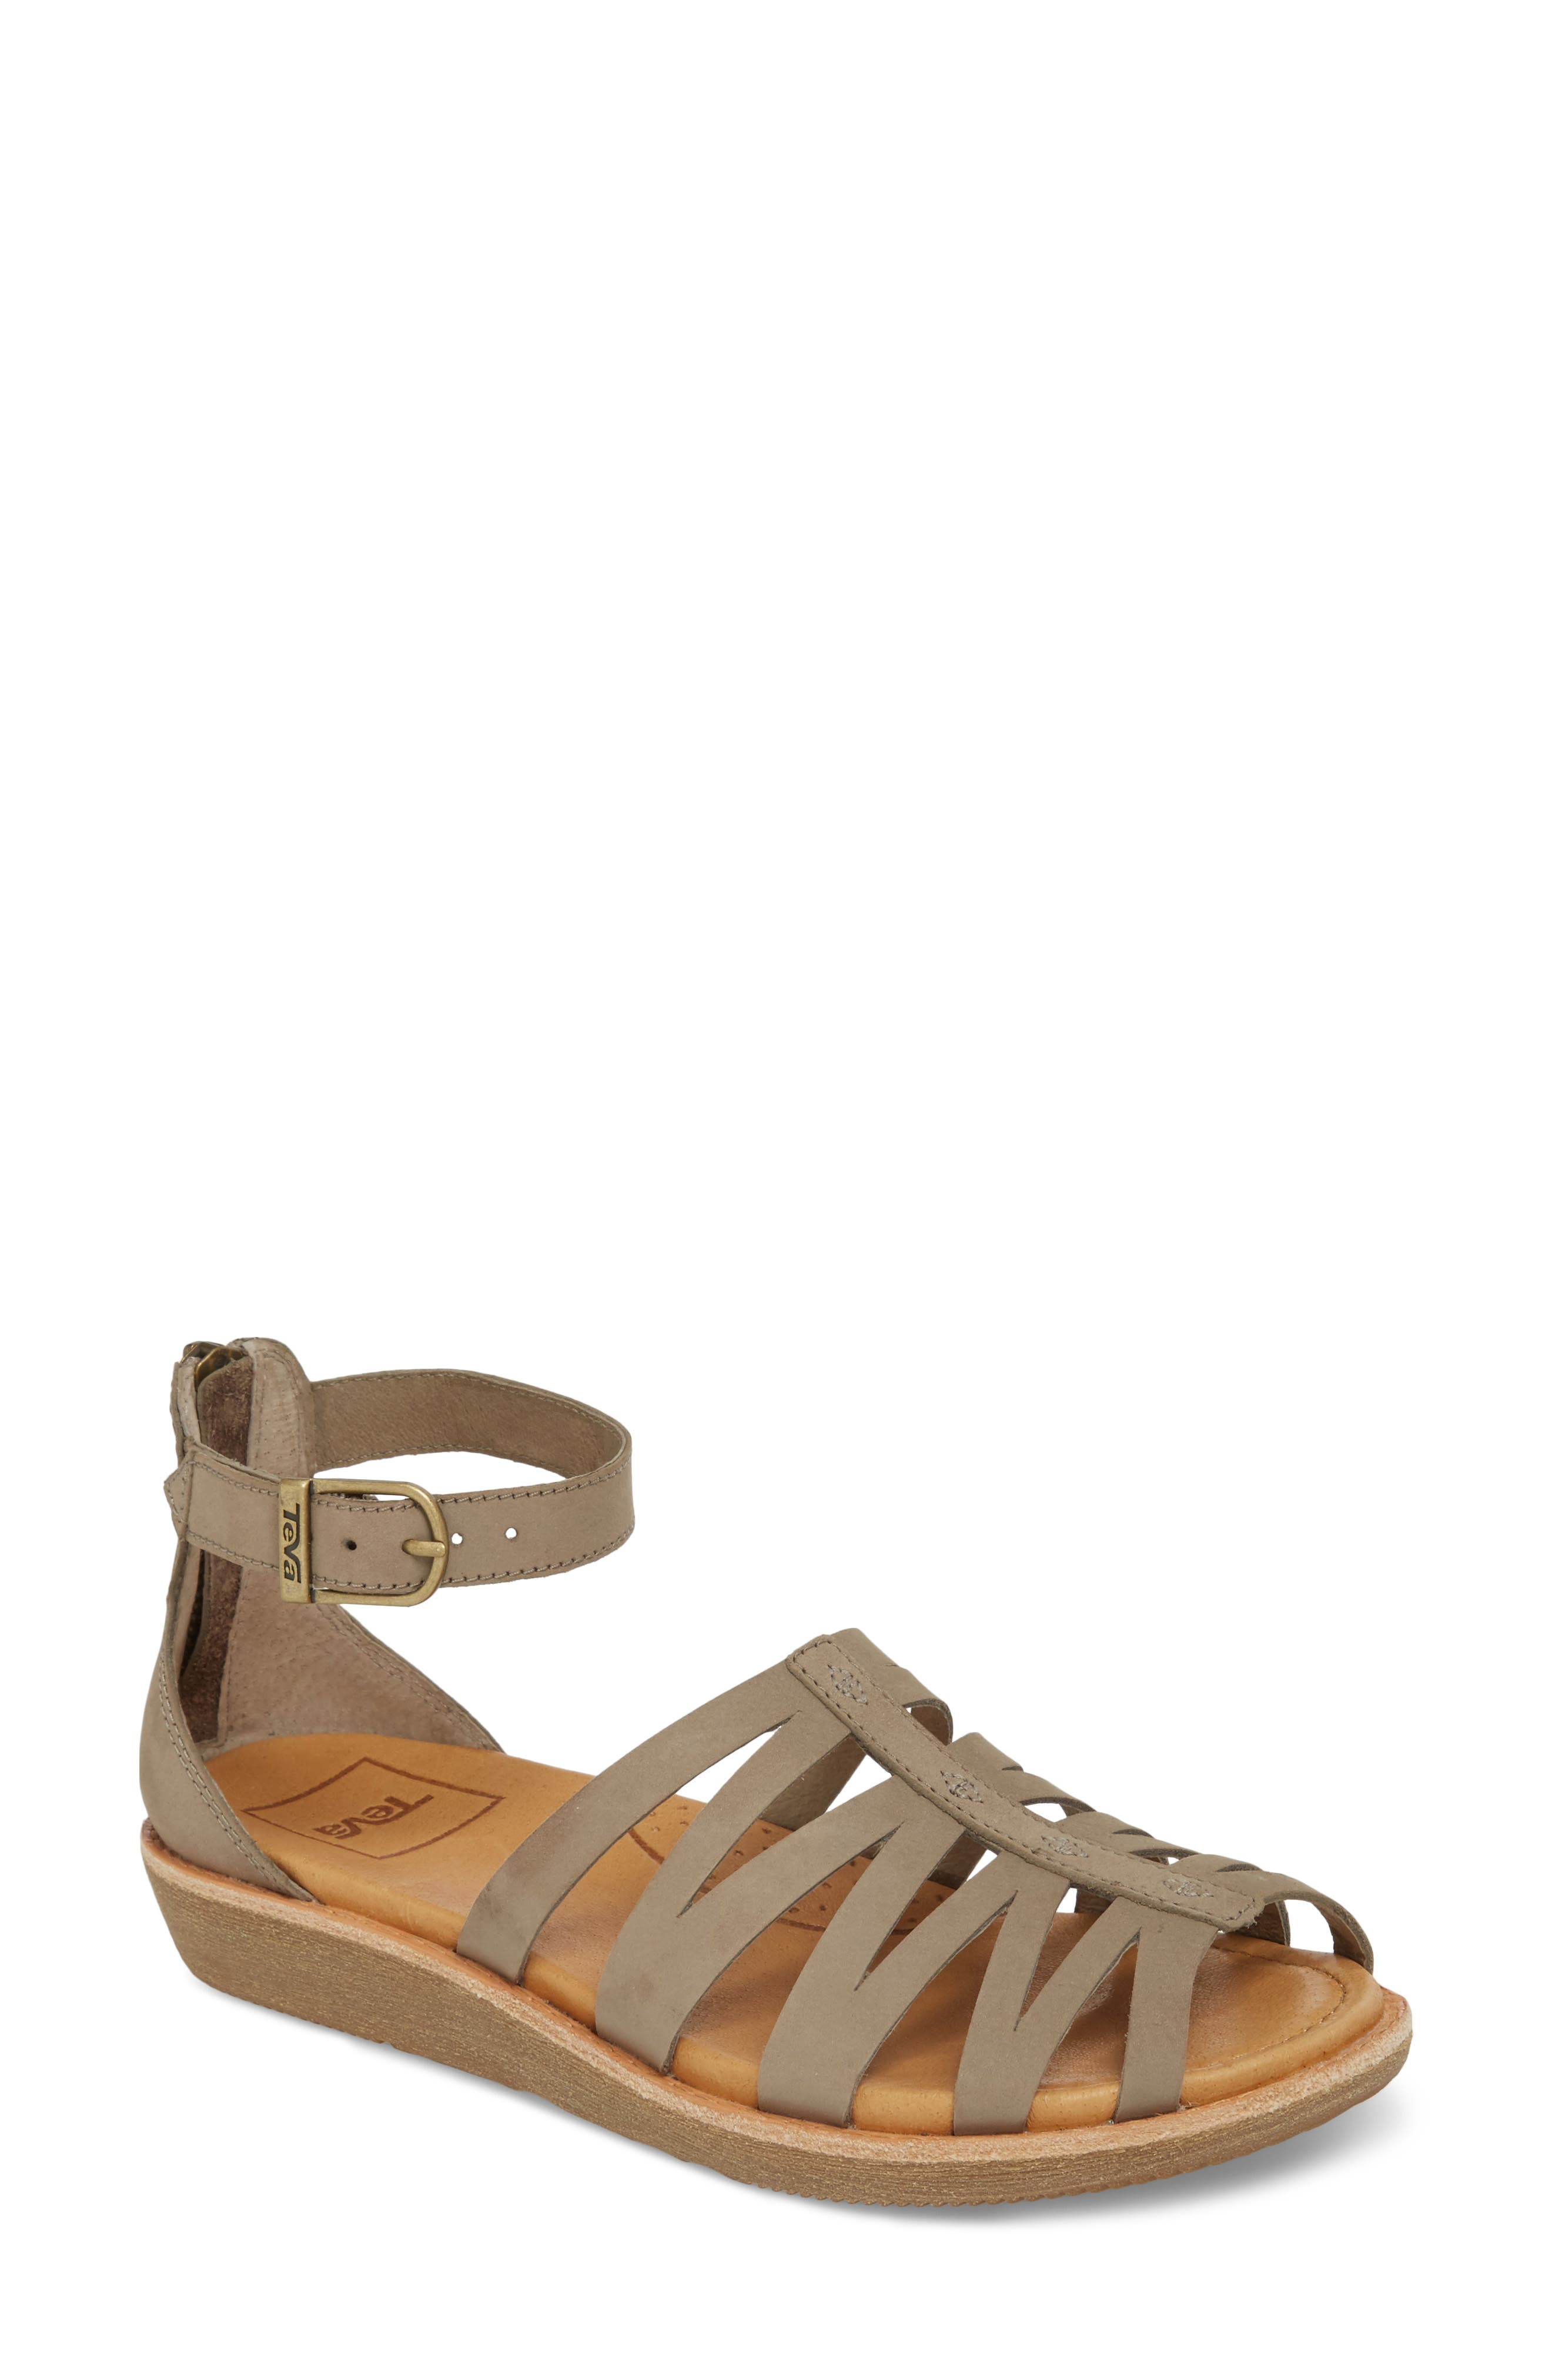 Encanta Sandal,                         Main,                         color, Taupe Leather